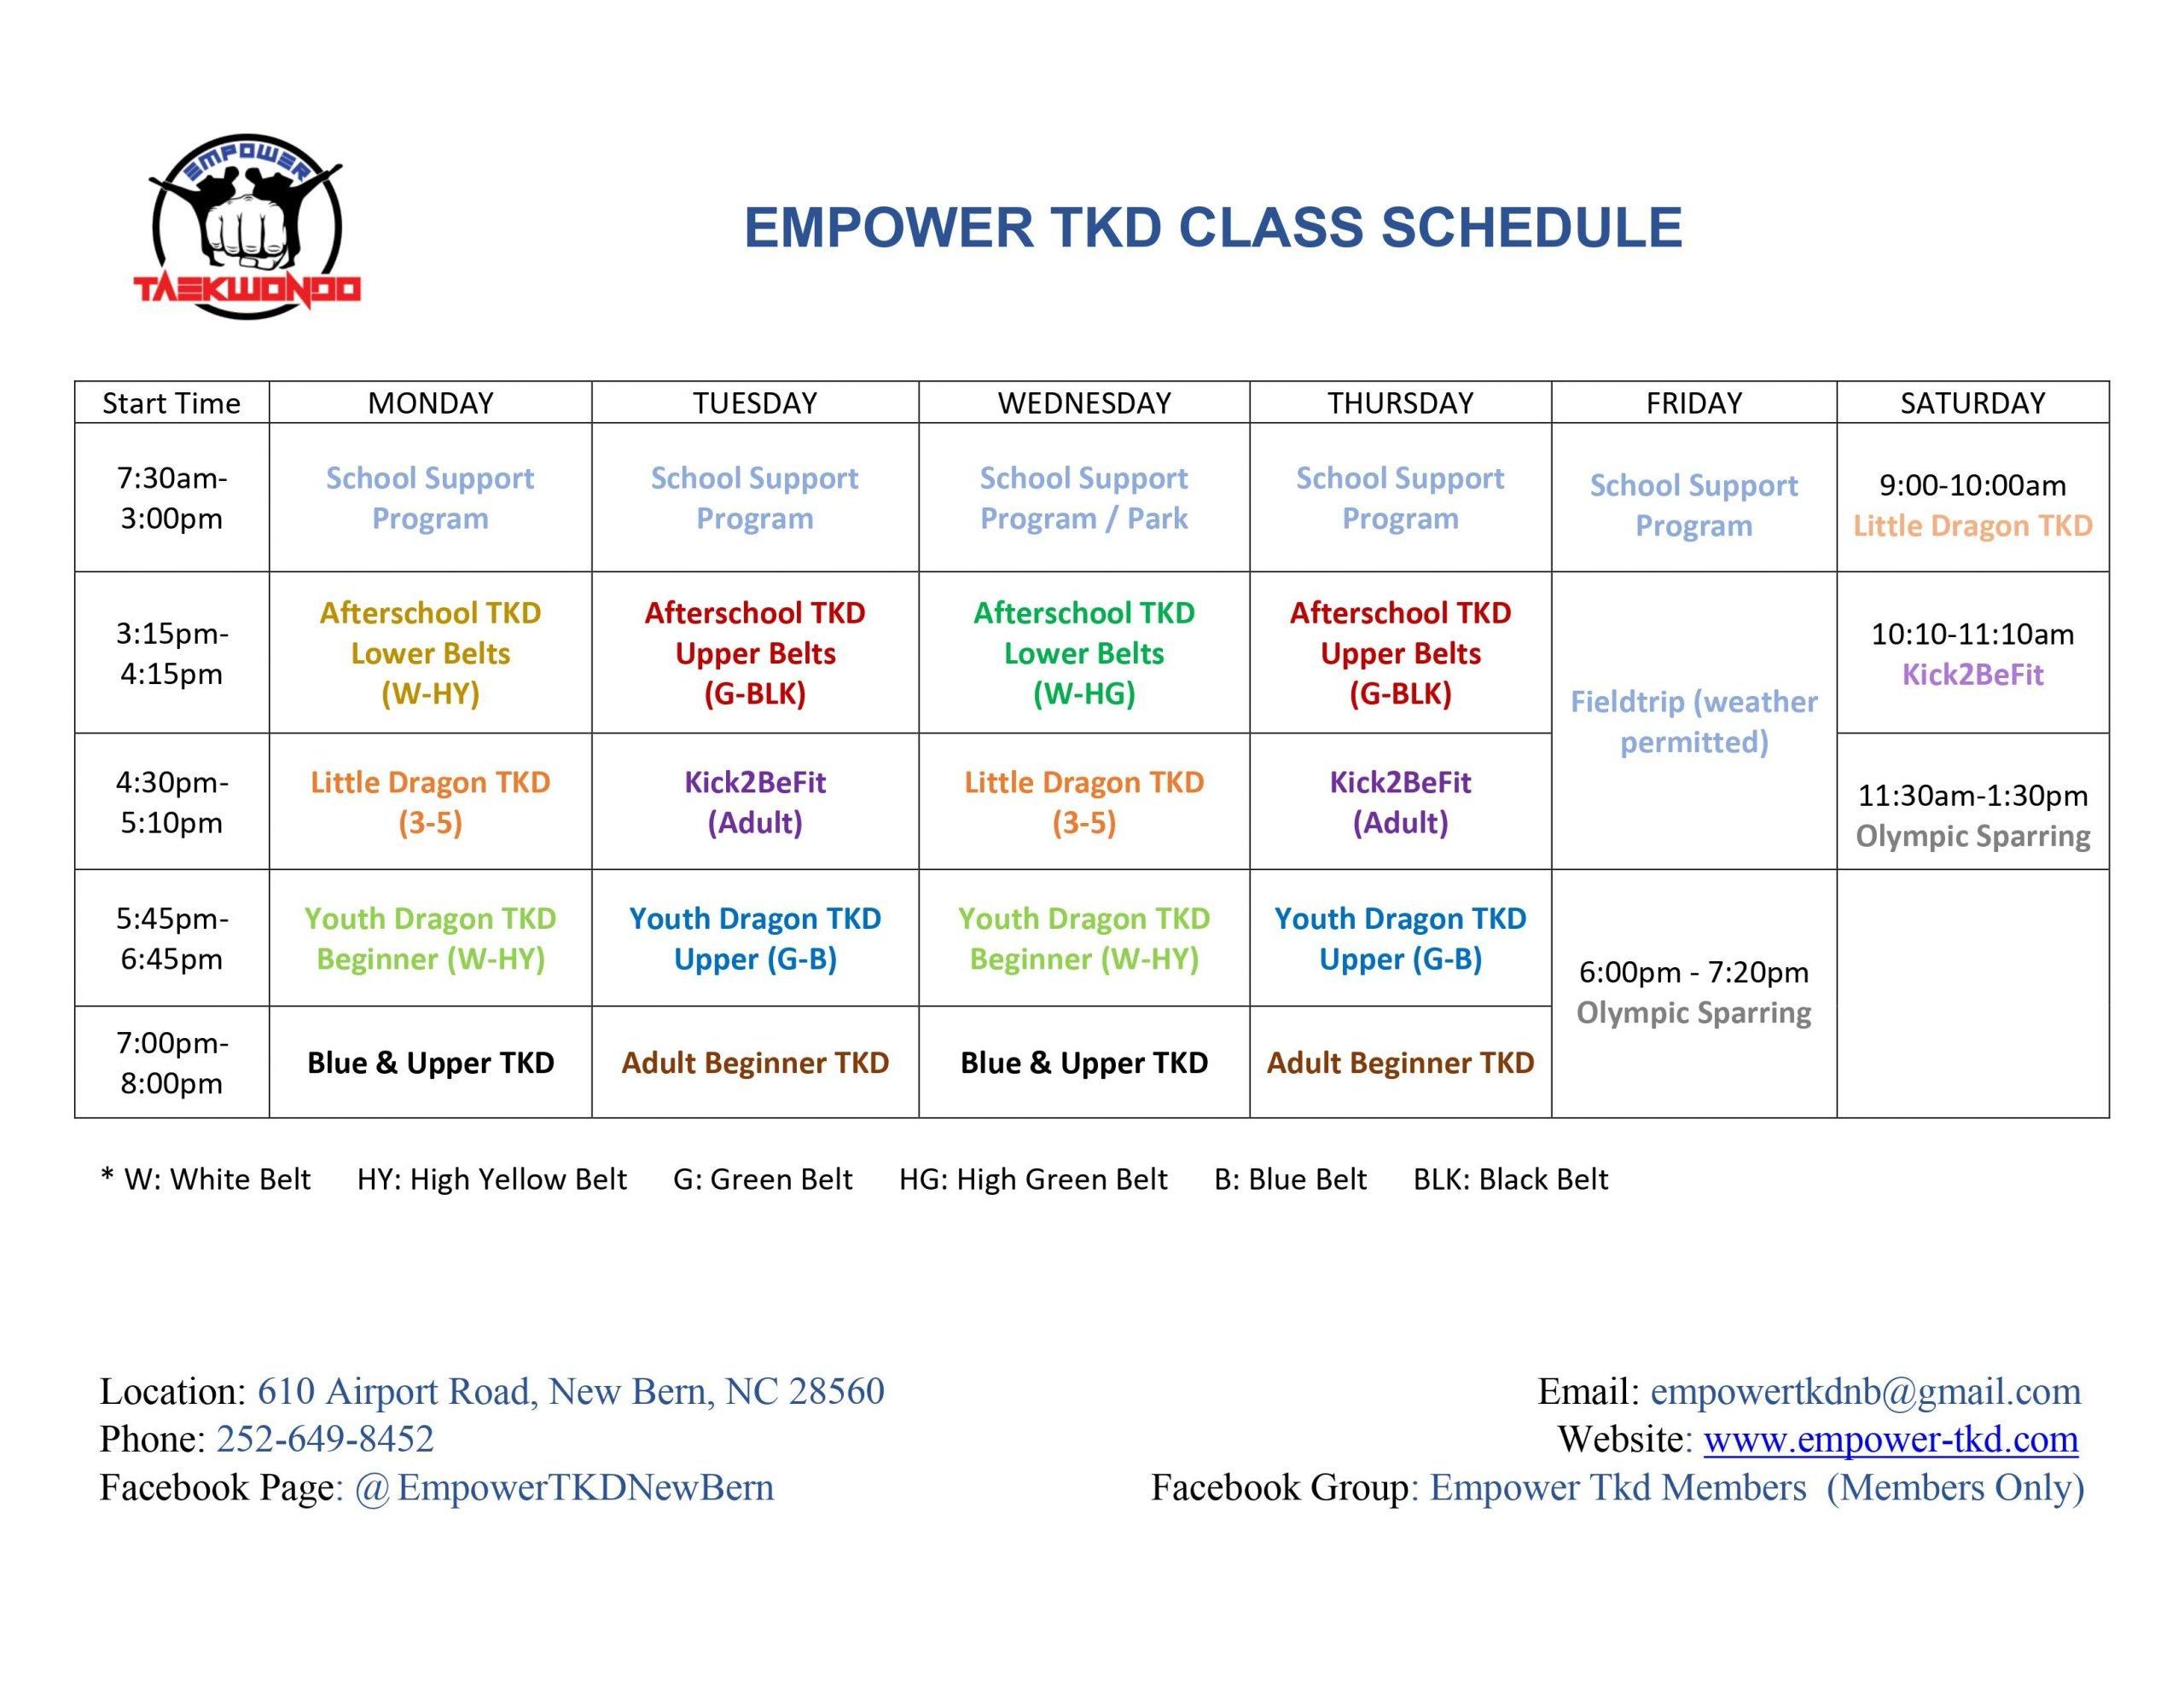 Empower TKD Evening Classes Schedule 202103